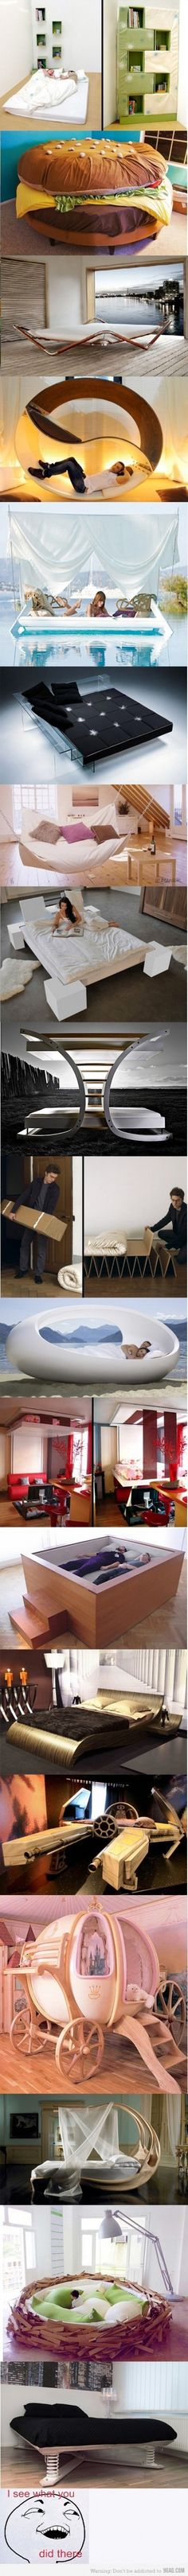 creative beds!